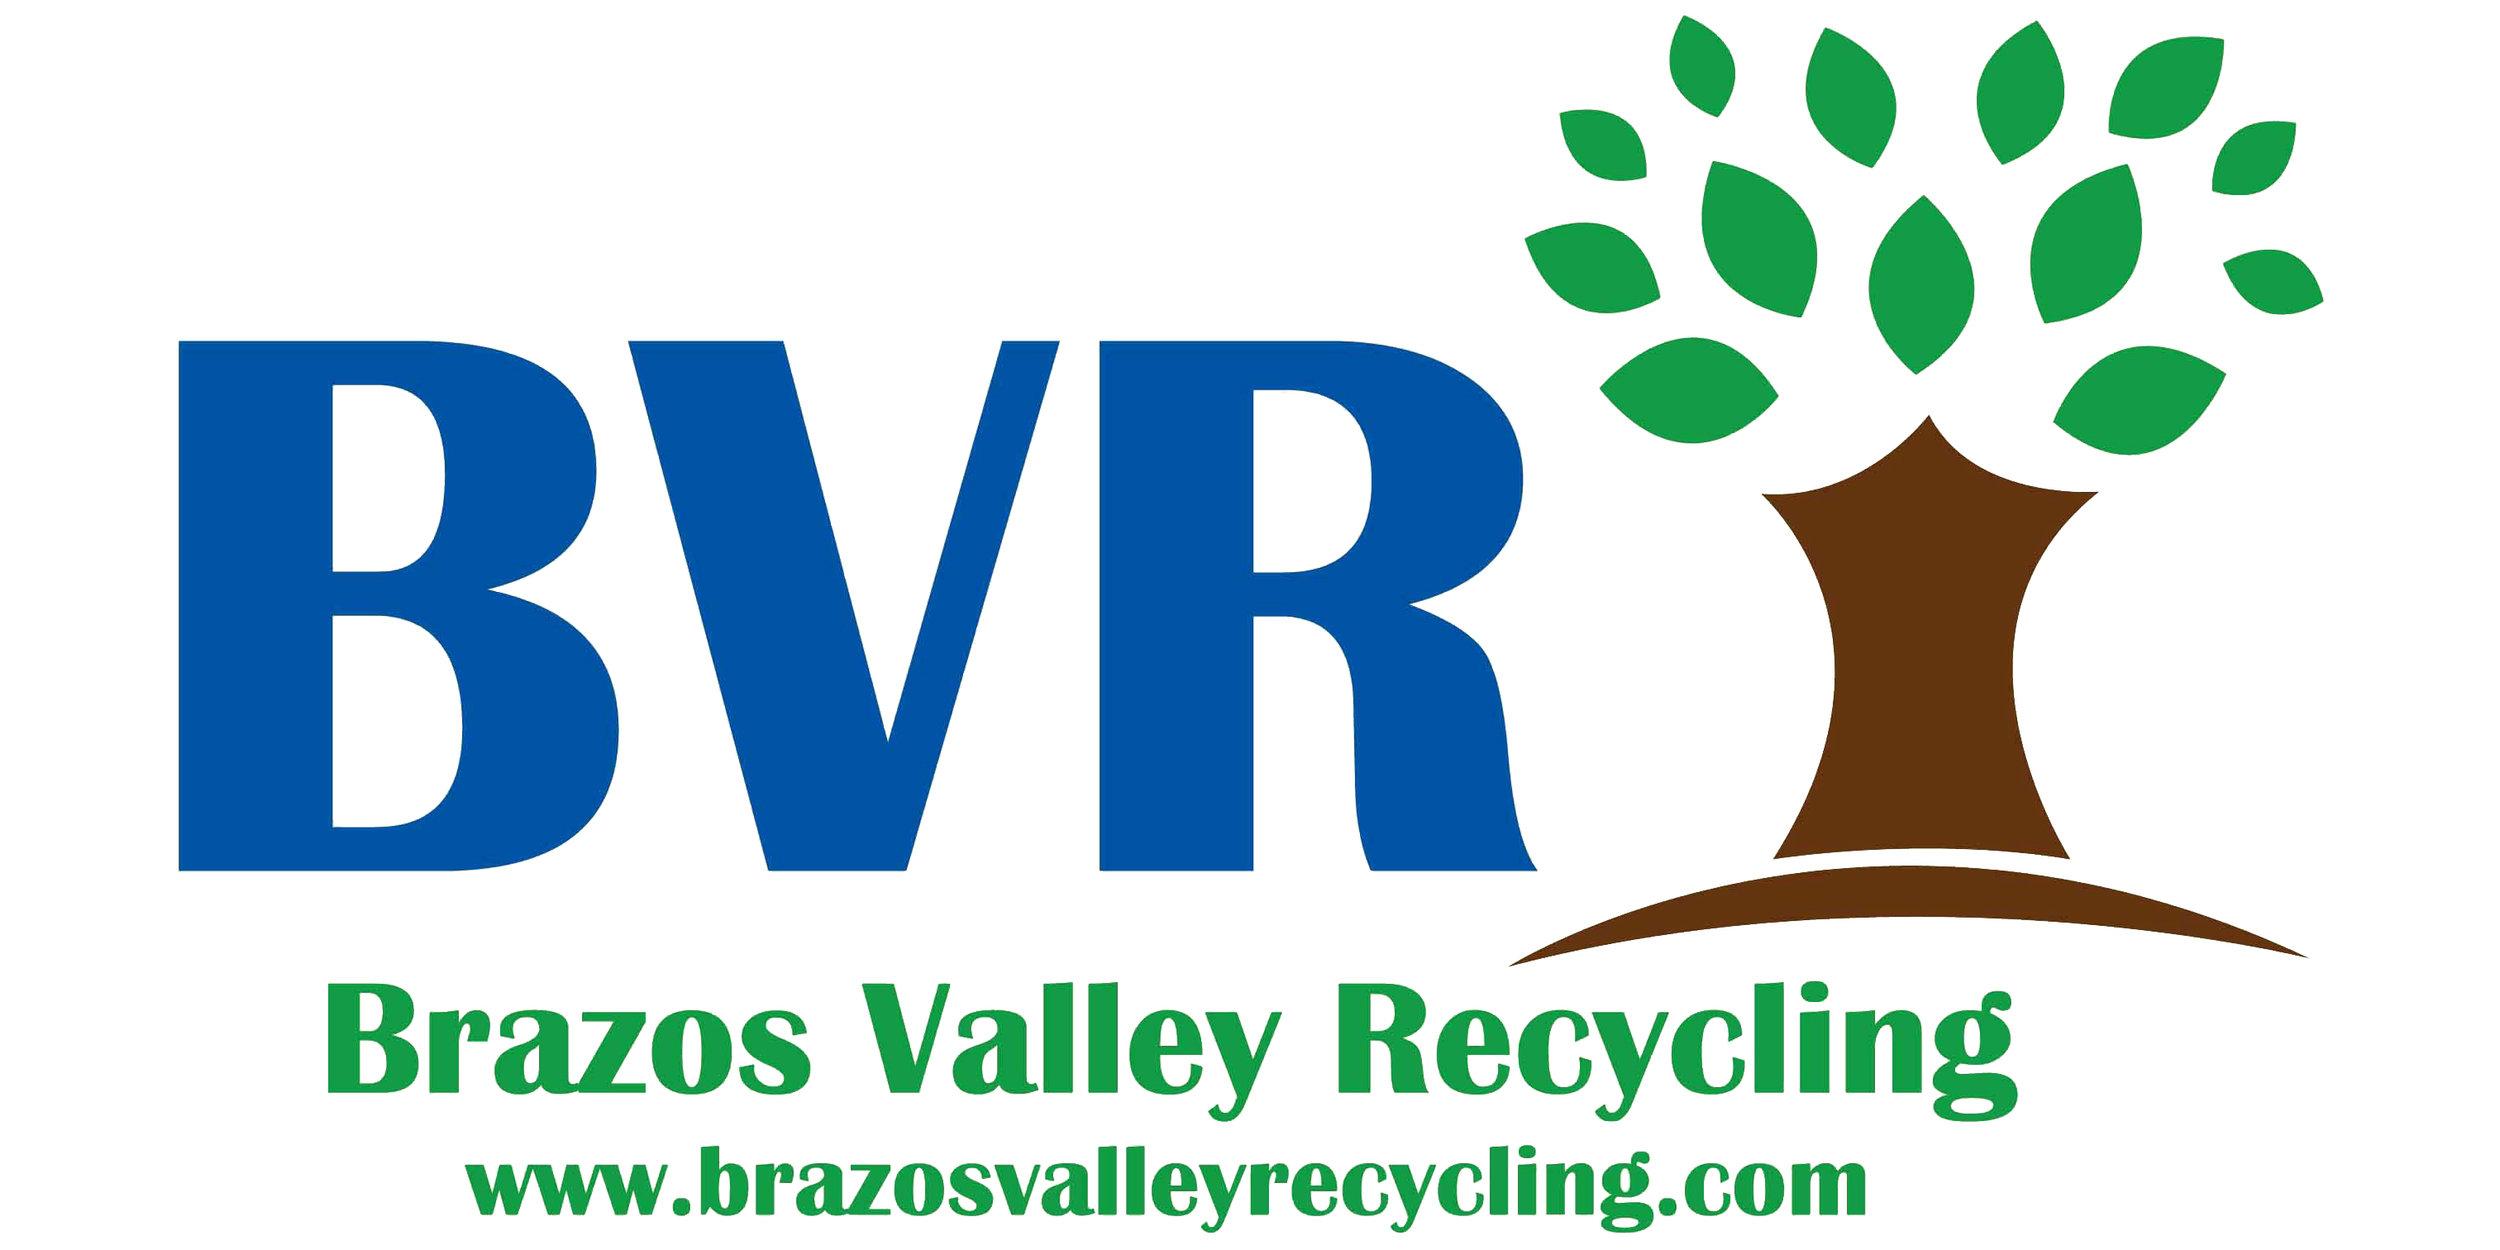 Brazos Valley RecyclingLOGO(16x9).jpg